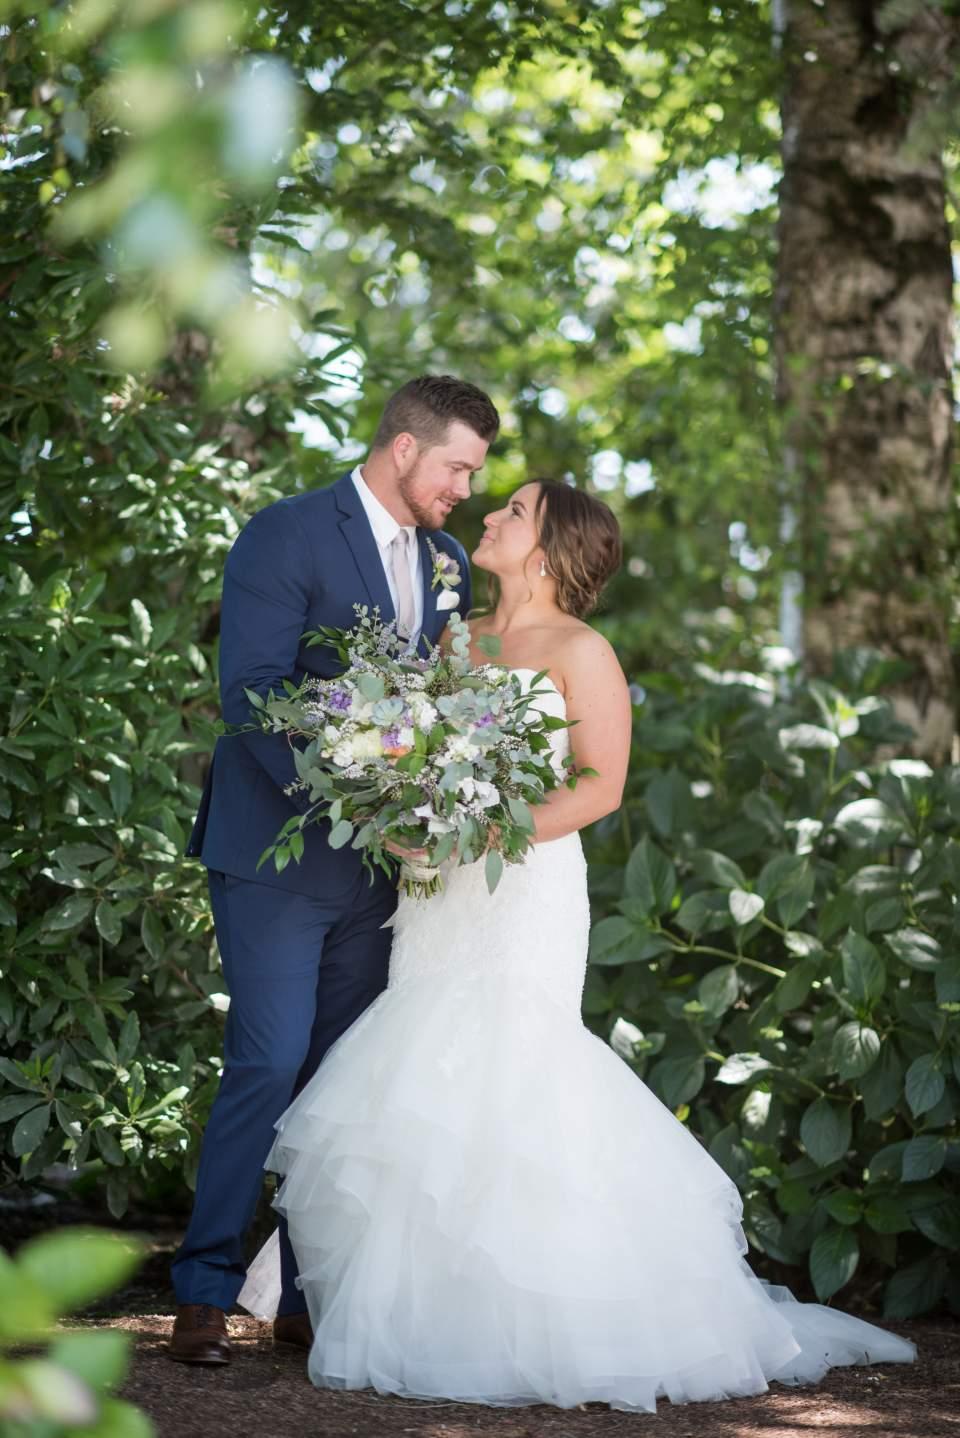 beautiful wedding day photos at maplehurst farm